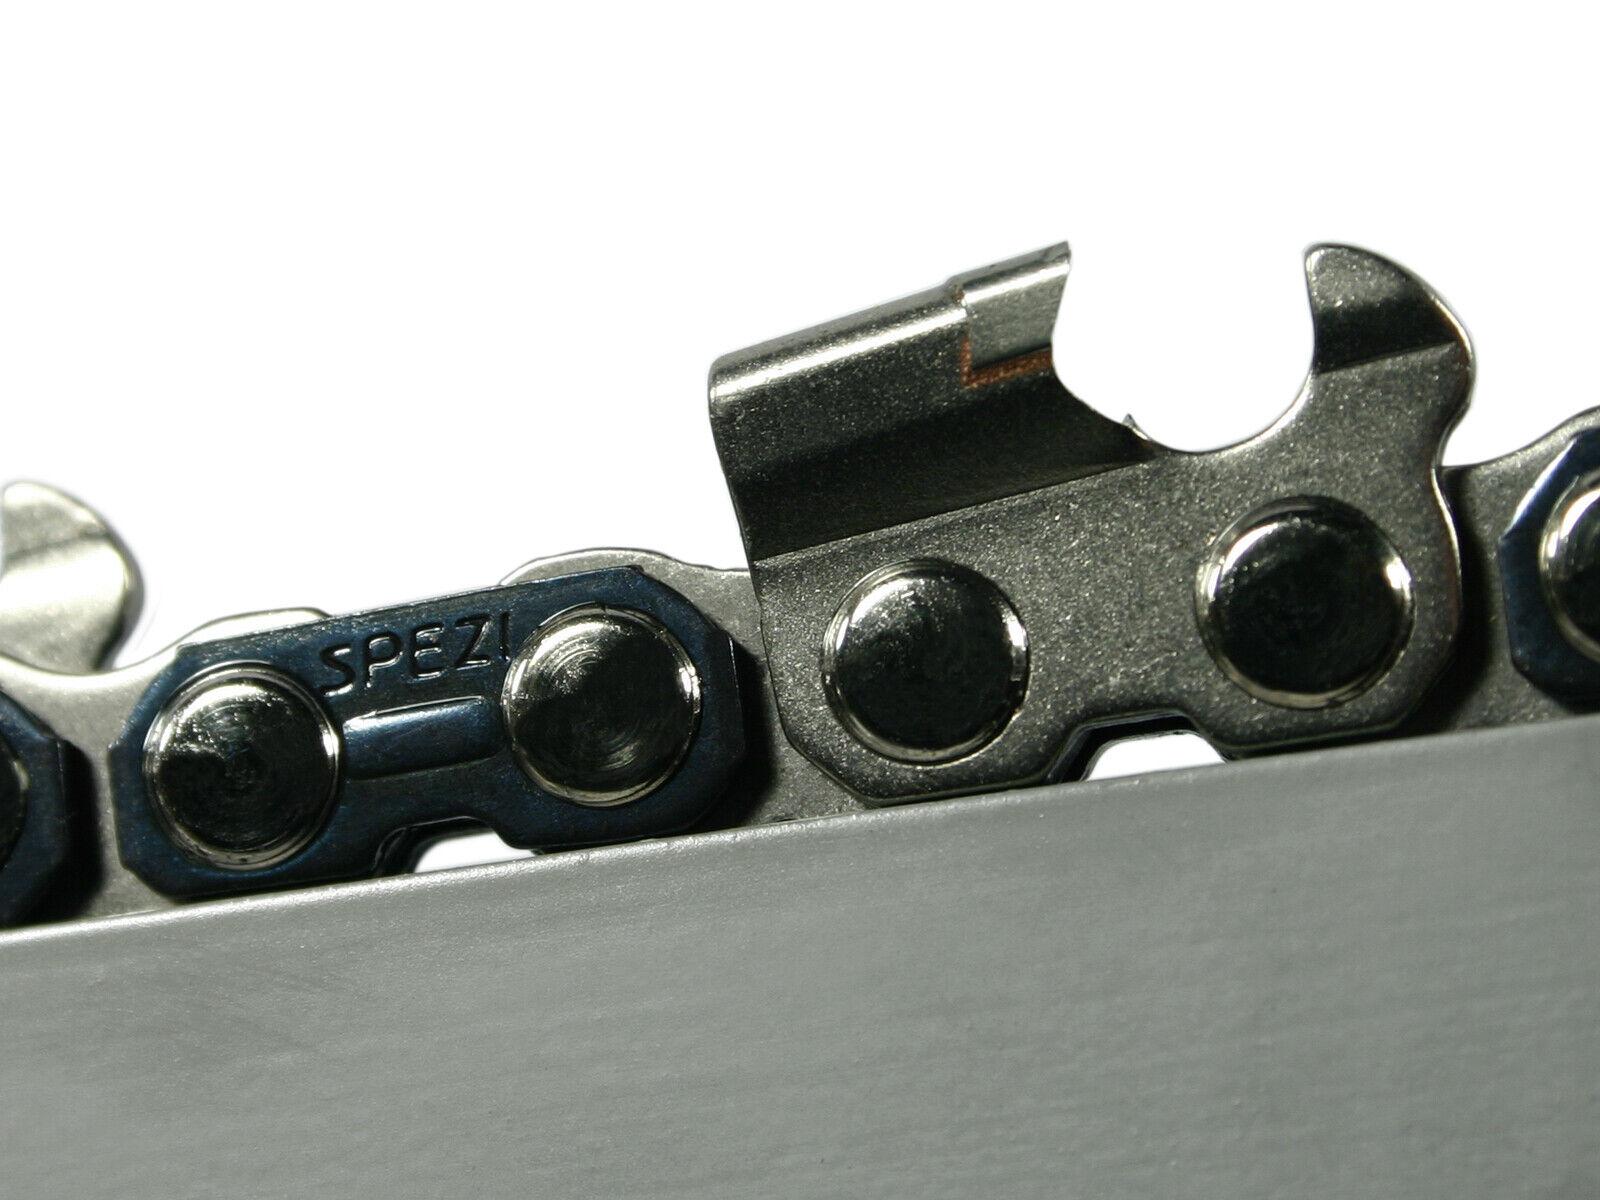 Metal duro cadena sierra adecuado para Husqvarna 272 130 cm 3 8  156 TG 1,6 mm Cochebide